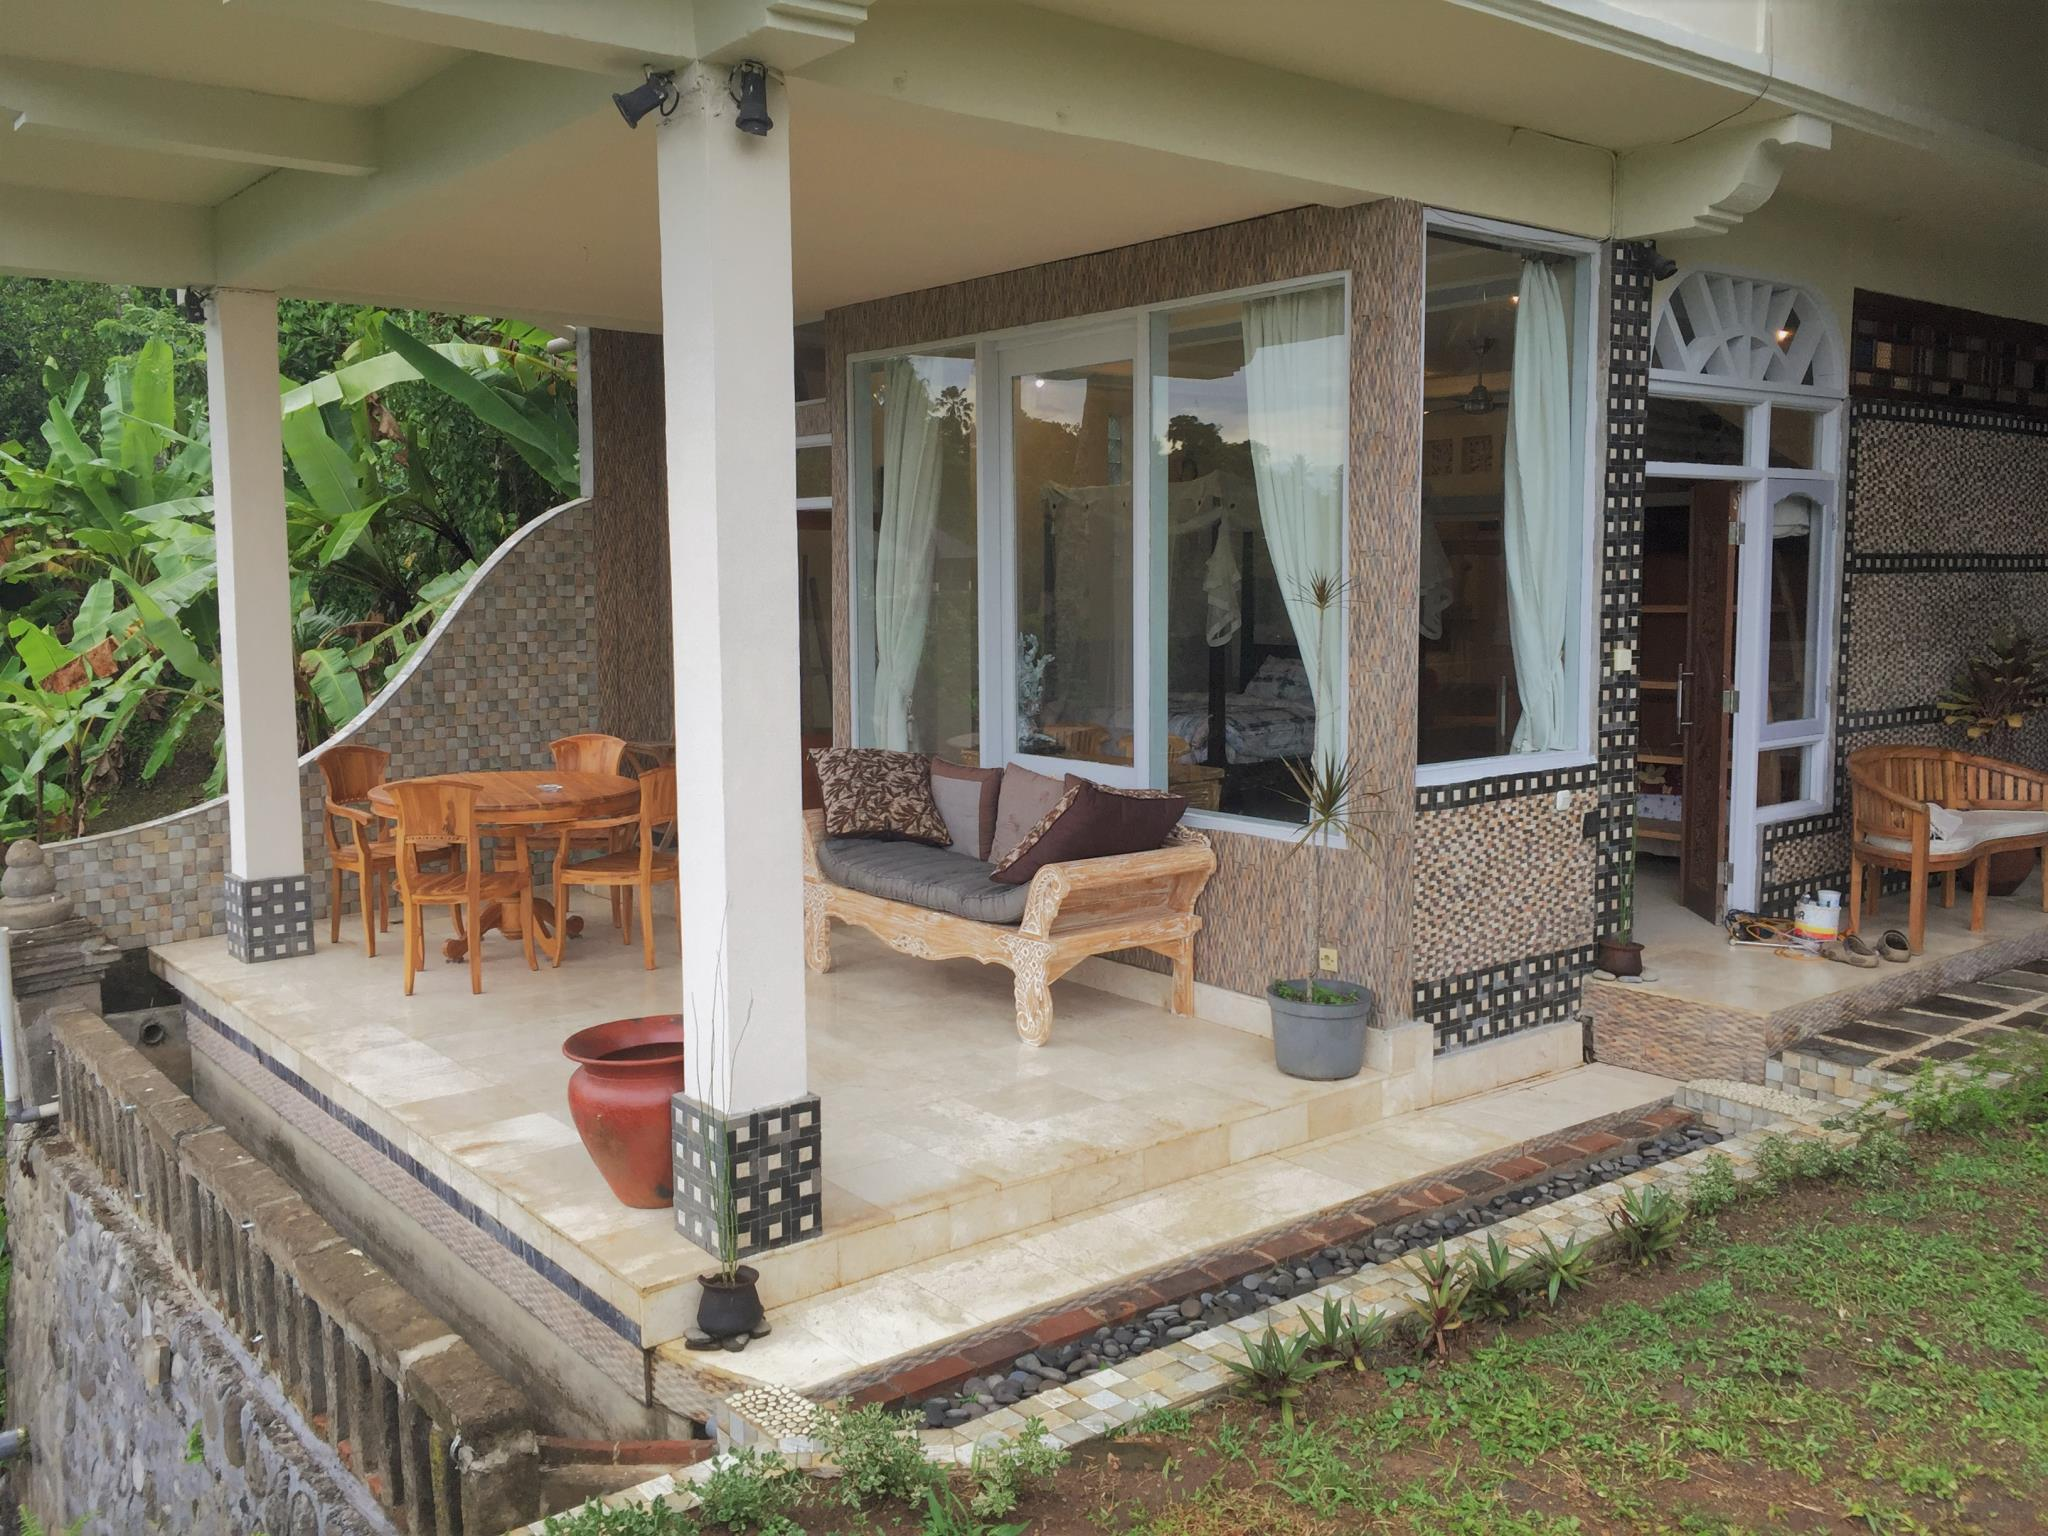 Best Price on Tirta Asri Ubud Villa in Bali + Reviews